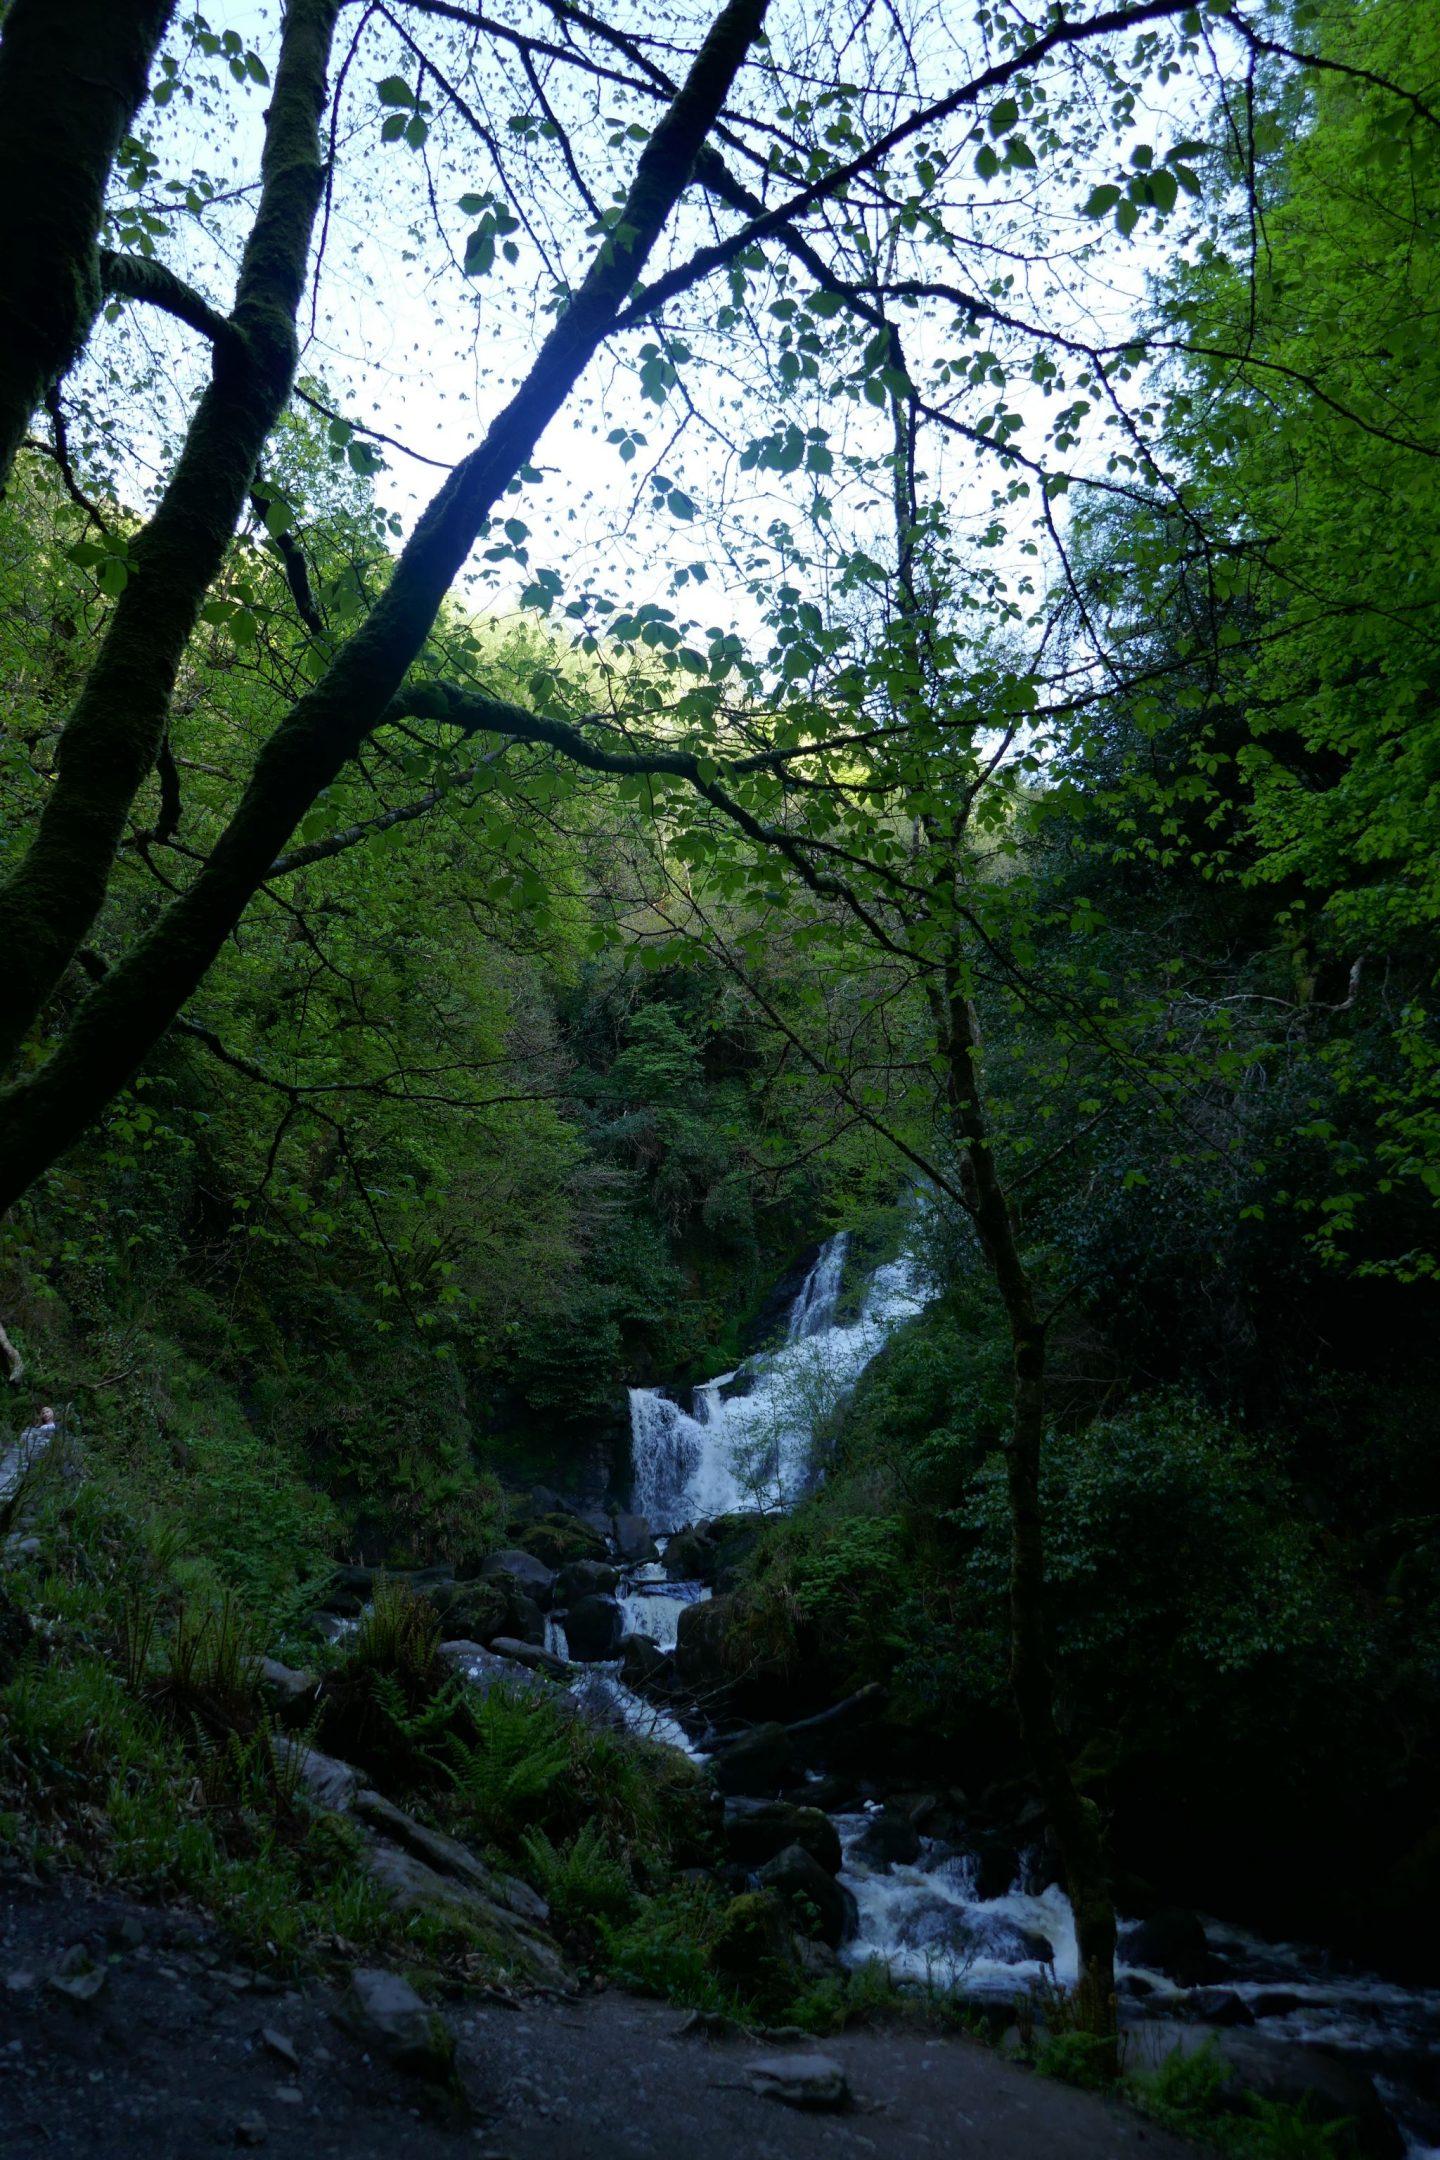 Looking back at Torc Waterfall